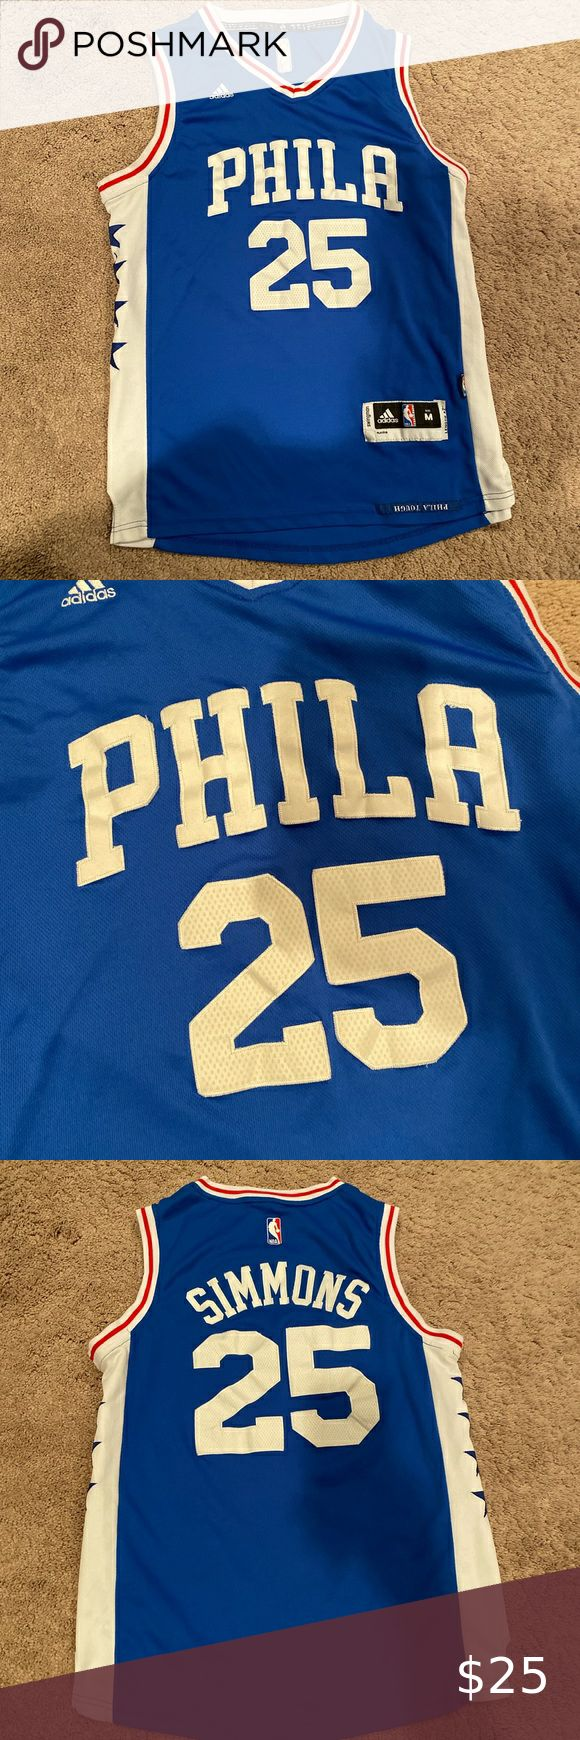 Check out this listing I just found on Poshmark: Philadelphia 76ers Ben Simmons Jersey. #shopmycloset #poshmark #shopping #style #pinitforlater #adidas #Other